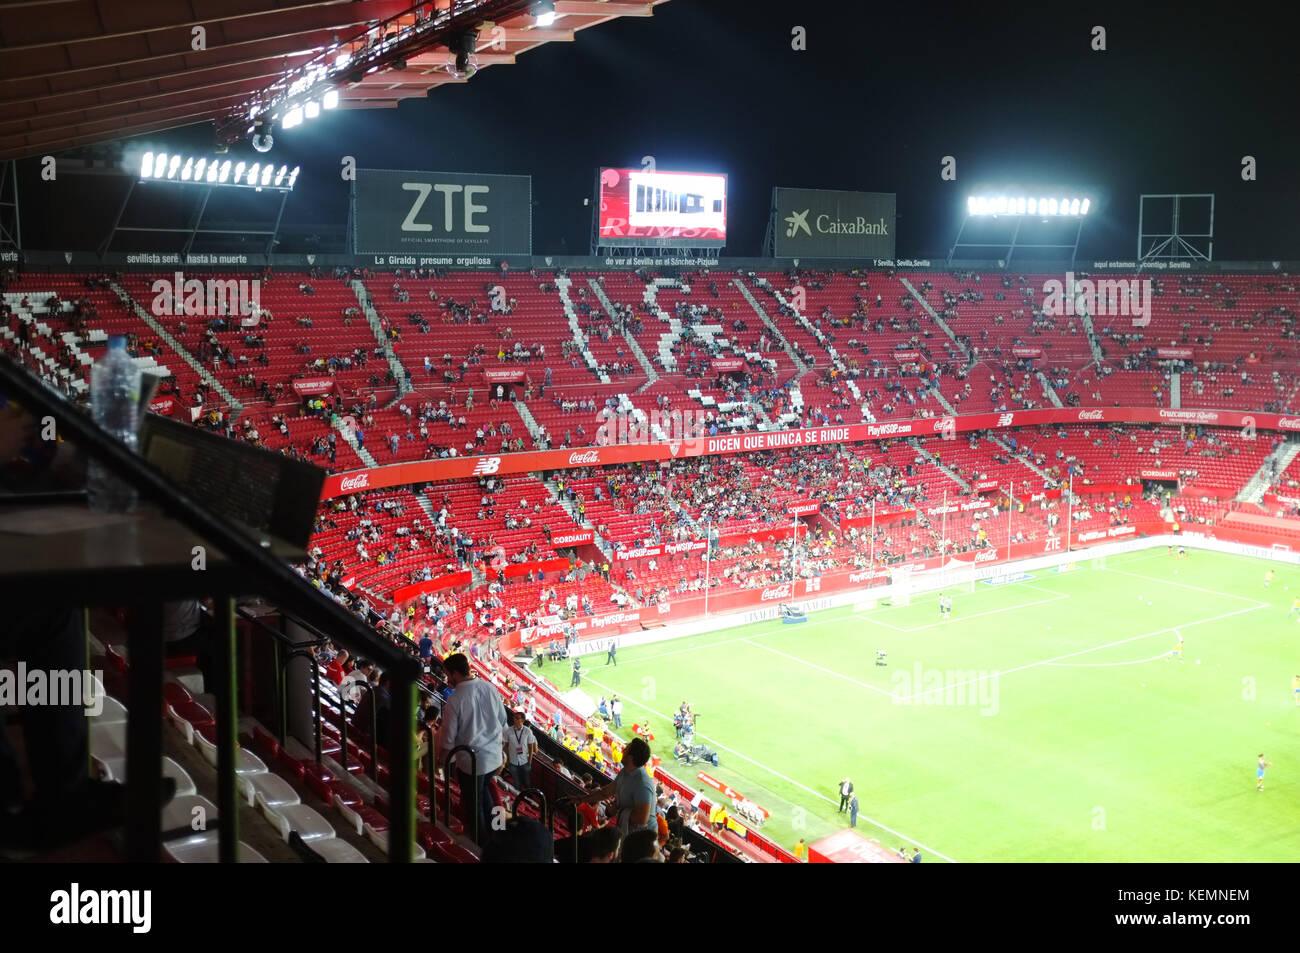 Inside the Ramón Sánchez Pizjuán Stadium, Sevilla FC vs Las Palmas, Seville, Andalucia, Spain, September - Stock Image